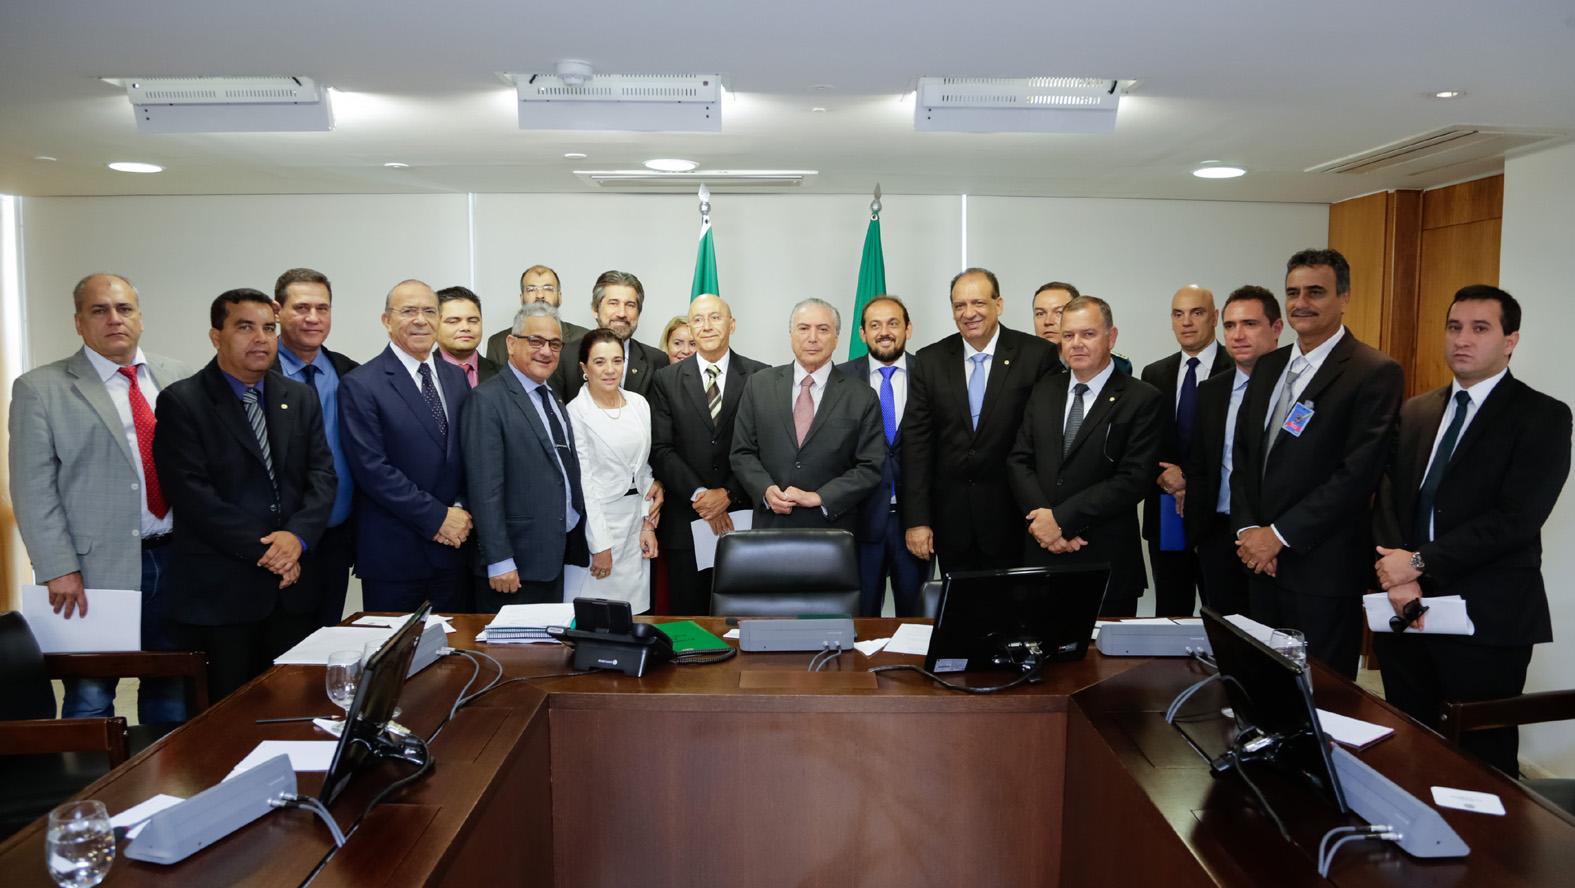 laerte-acredita-em-avancos-na-regularizacao-fundiaria-apos-reuniao-em-brasilia.jpg